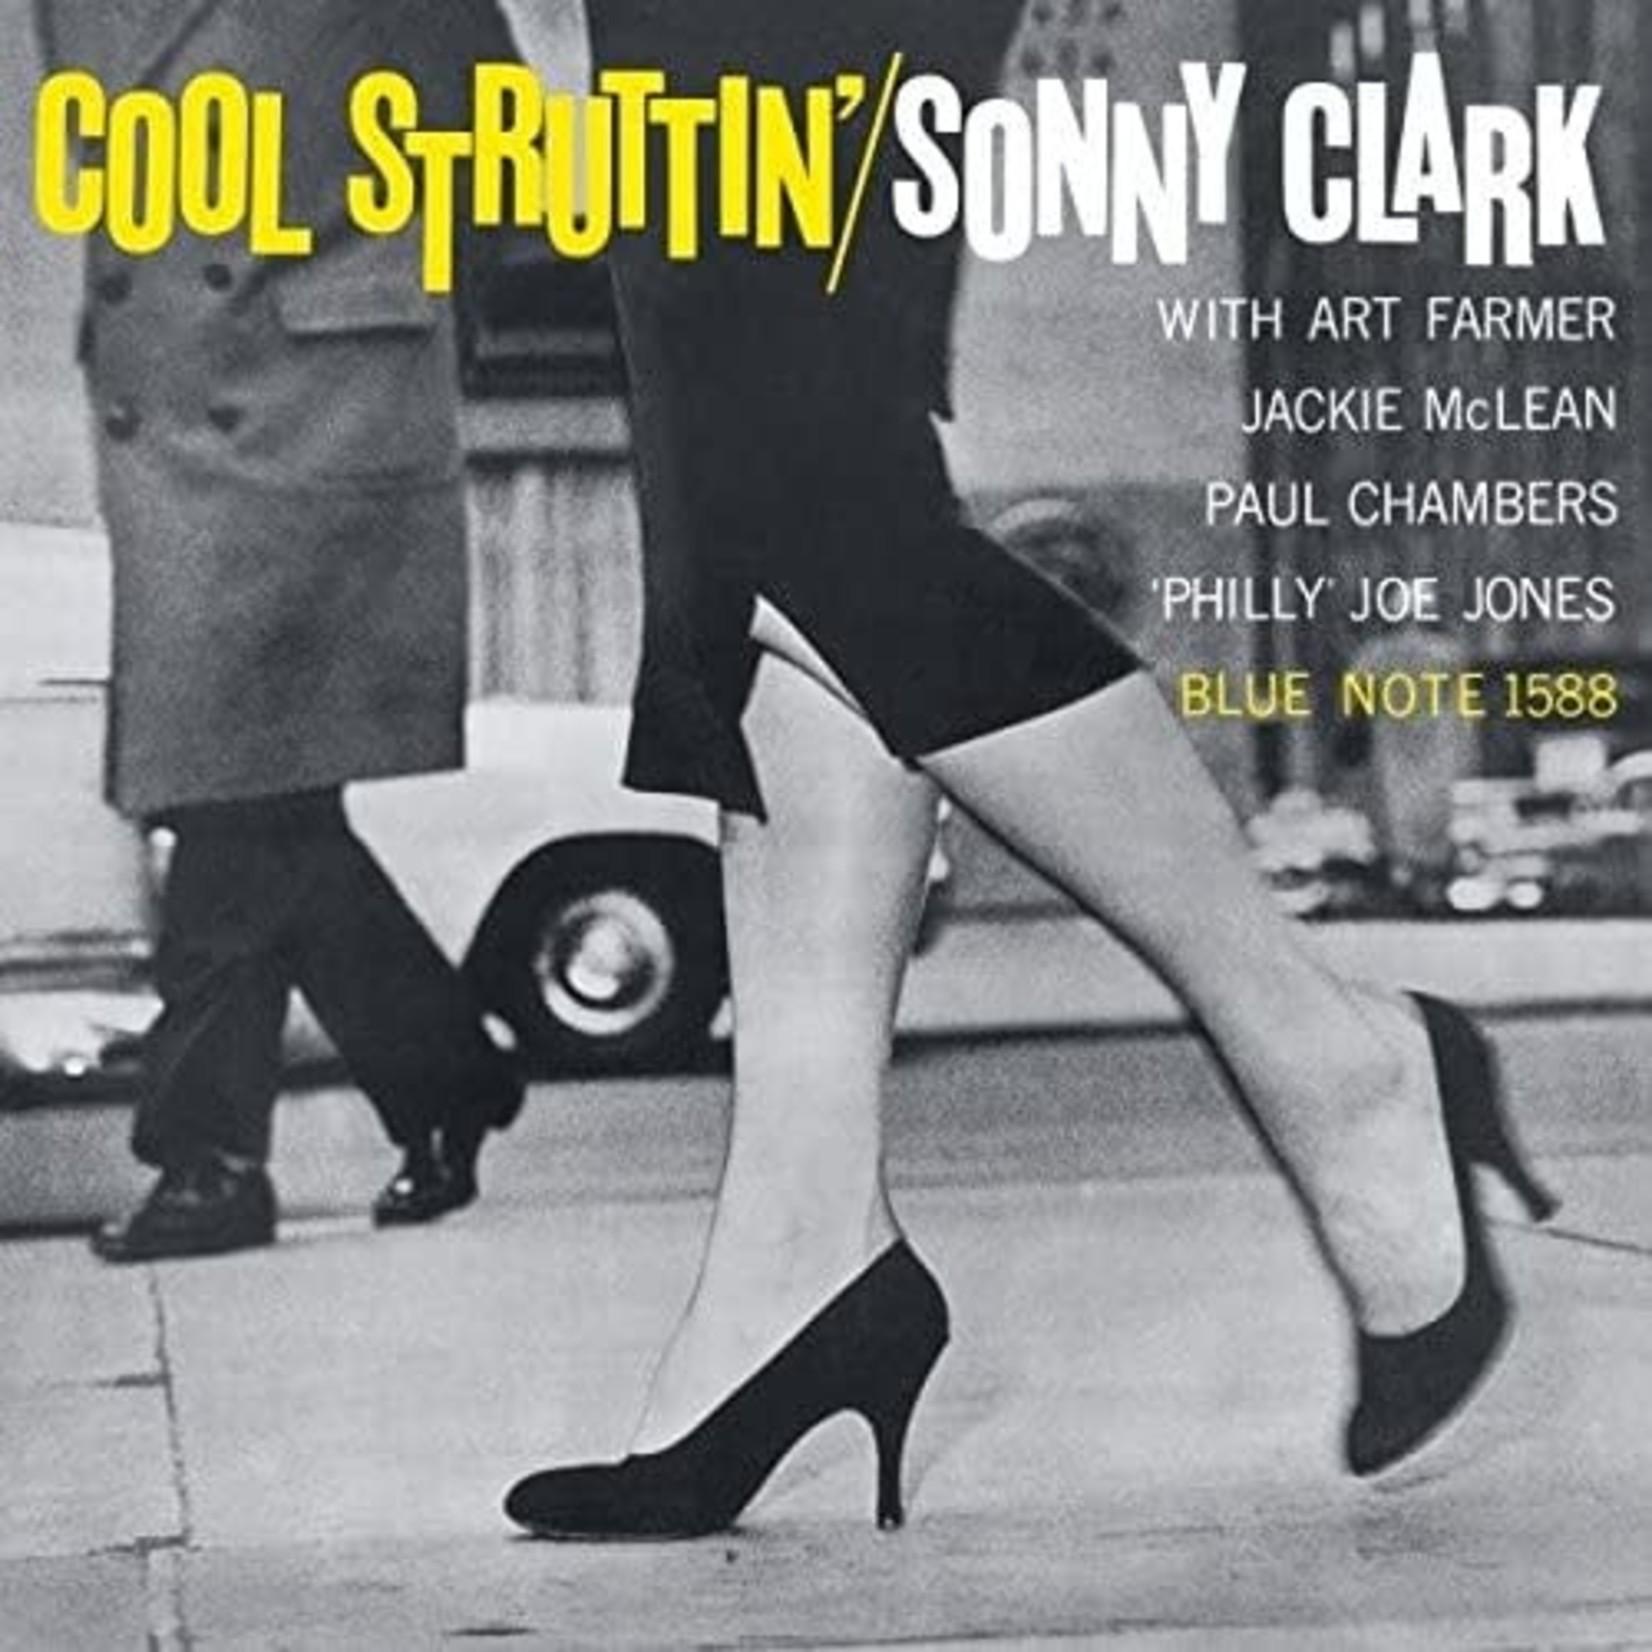 Sonny Clark CLARK, SONNY - COOL STRUTTIN